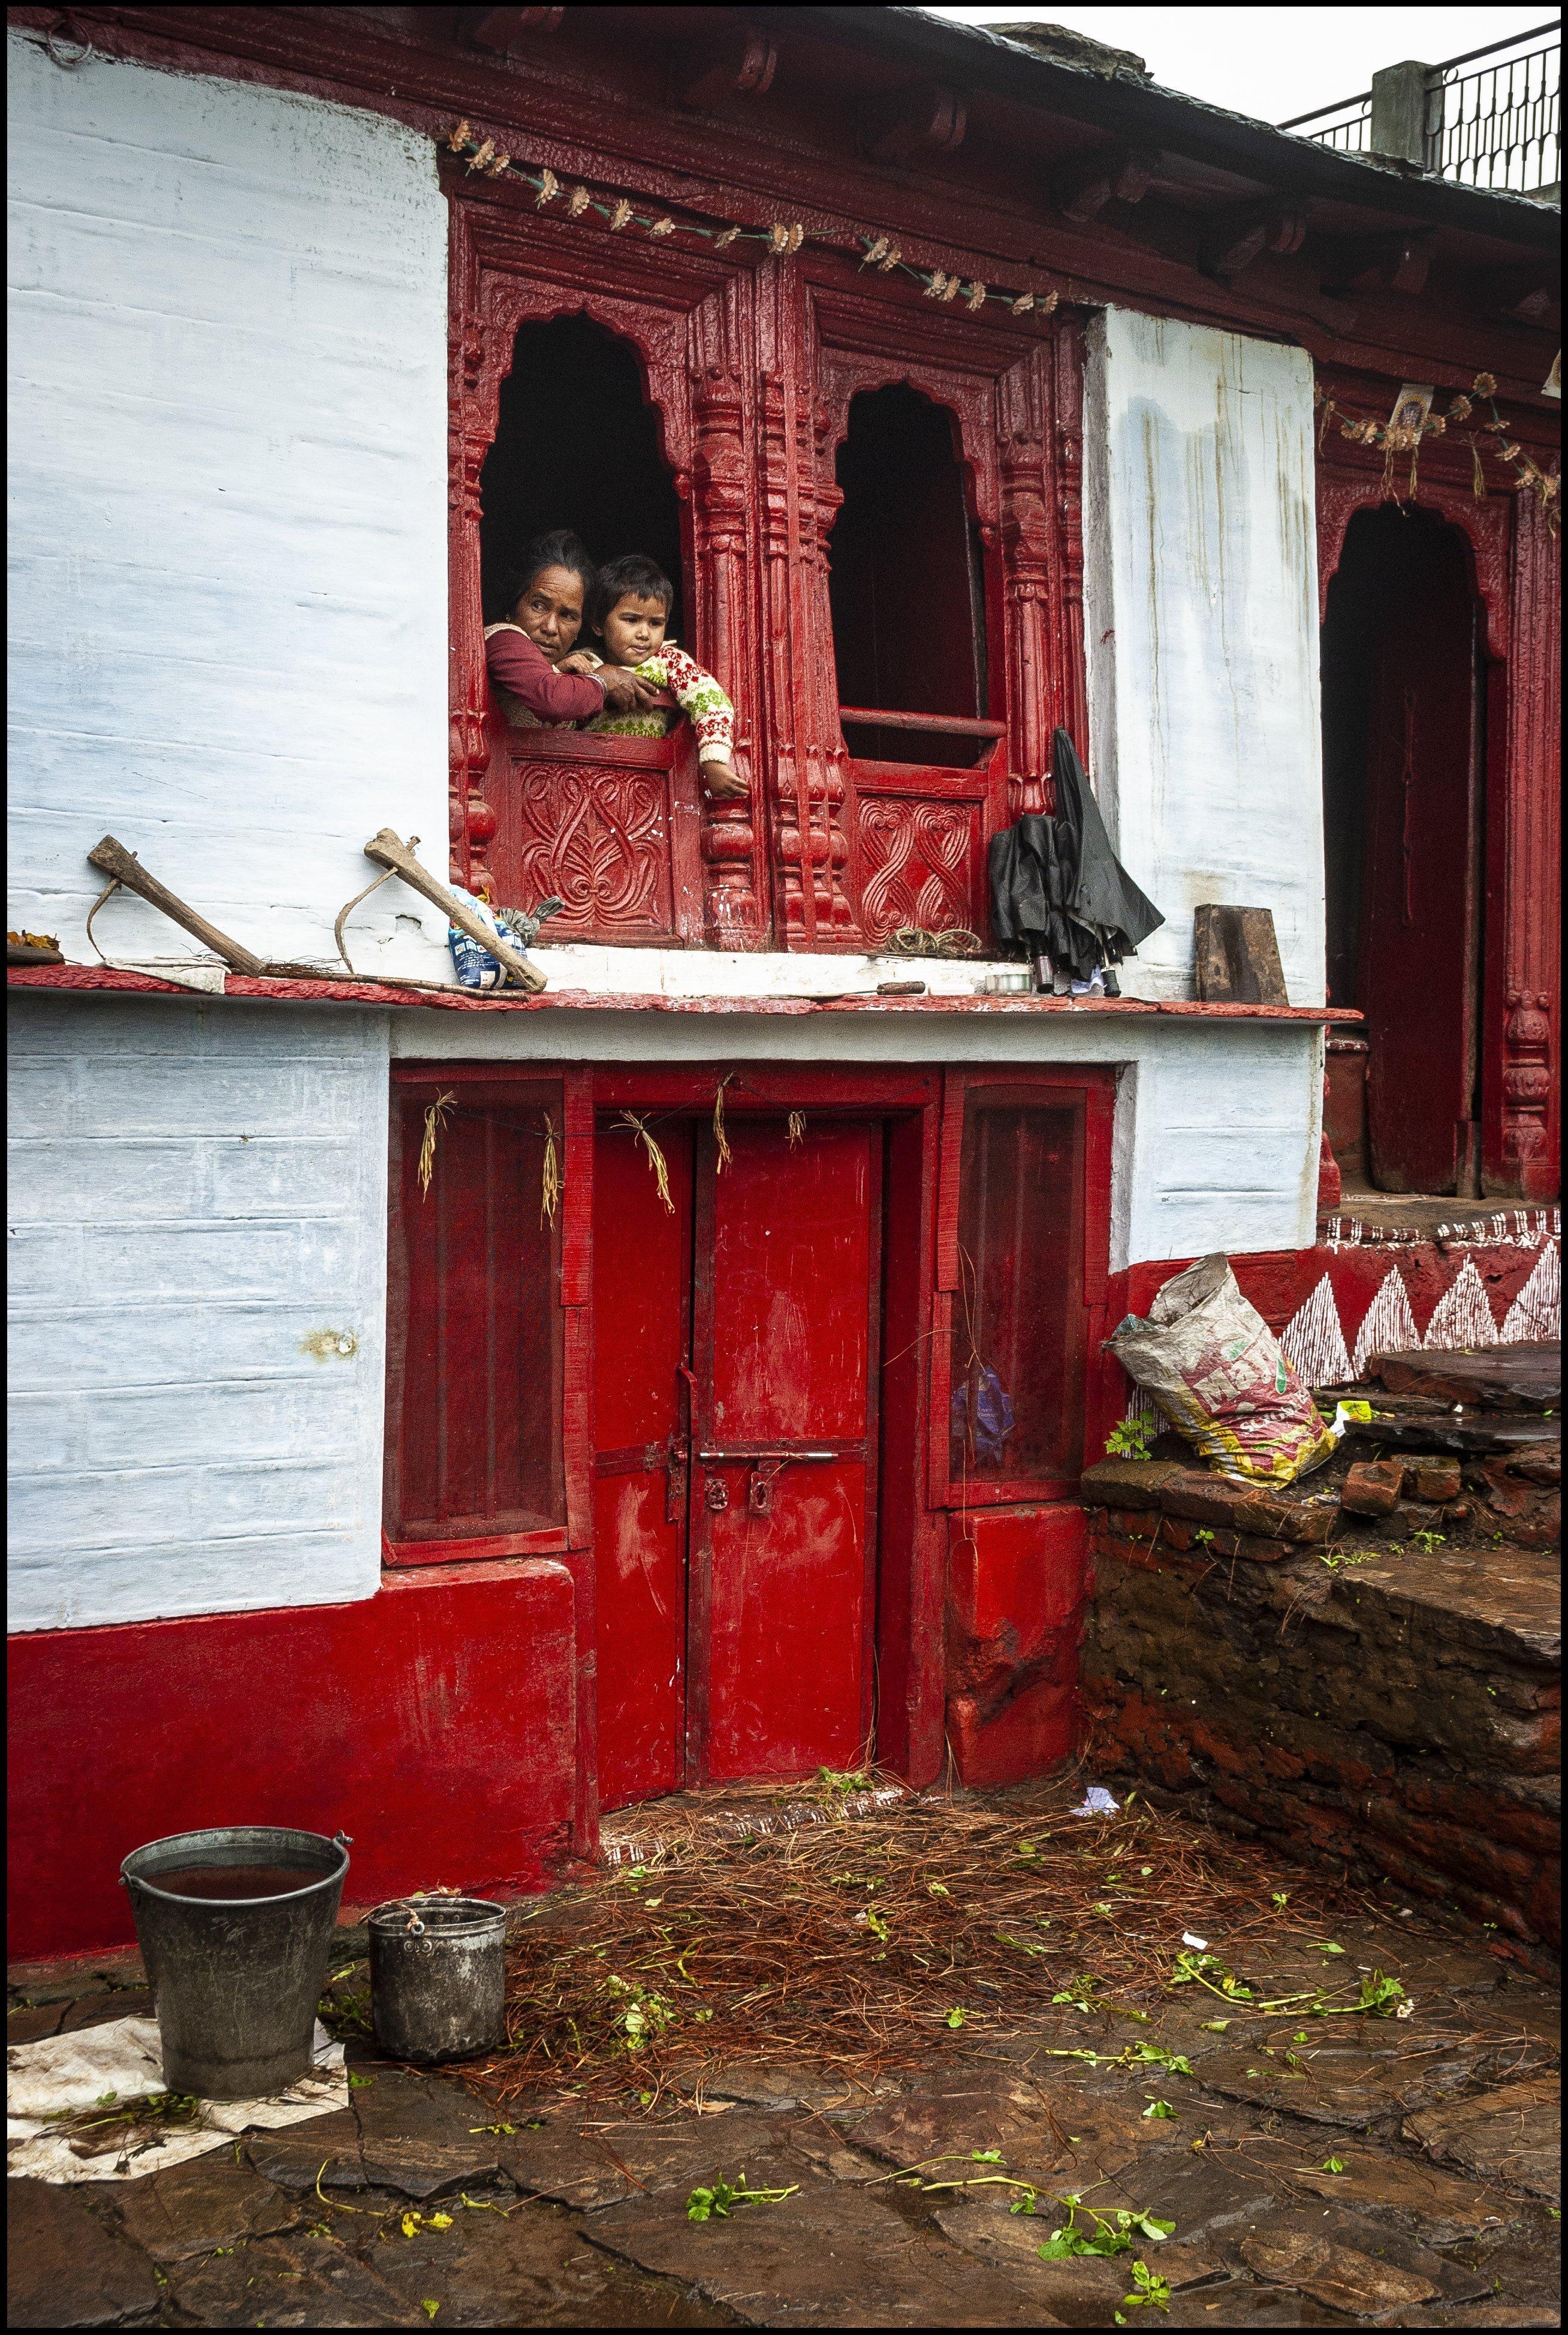 Majkhali, Kumaun Himalaya, Uttarakhand, India